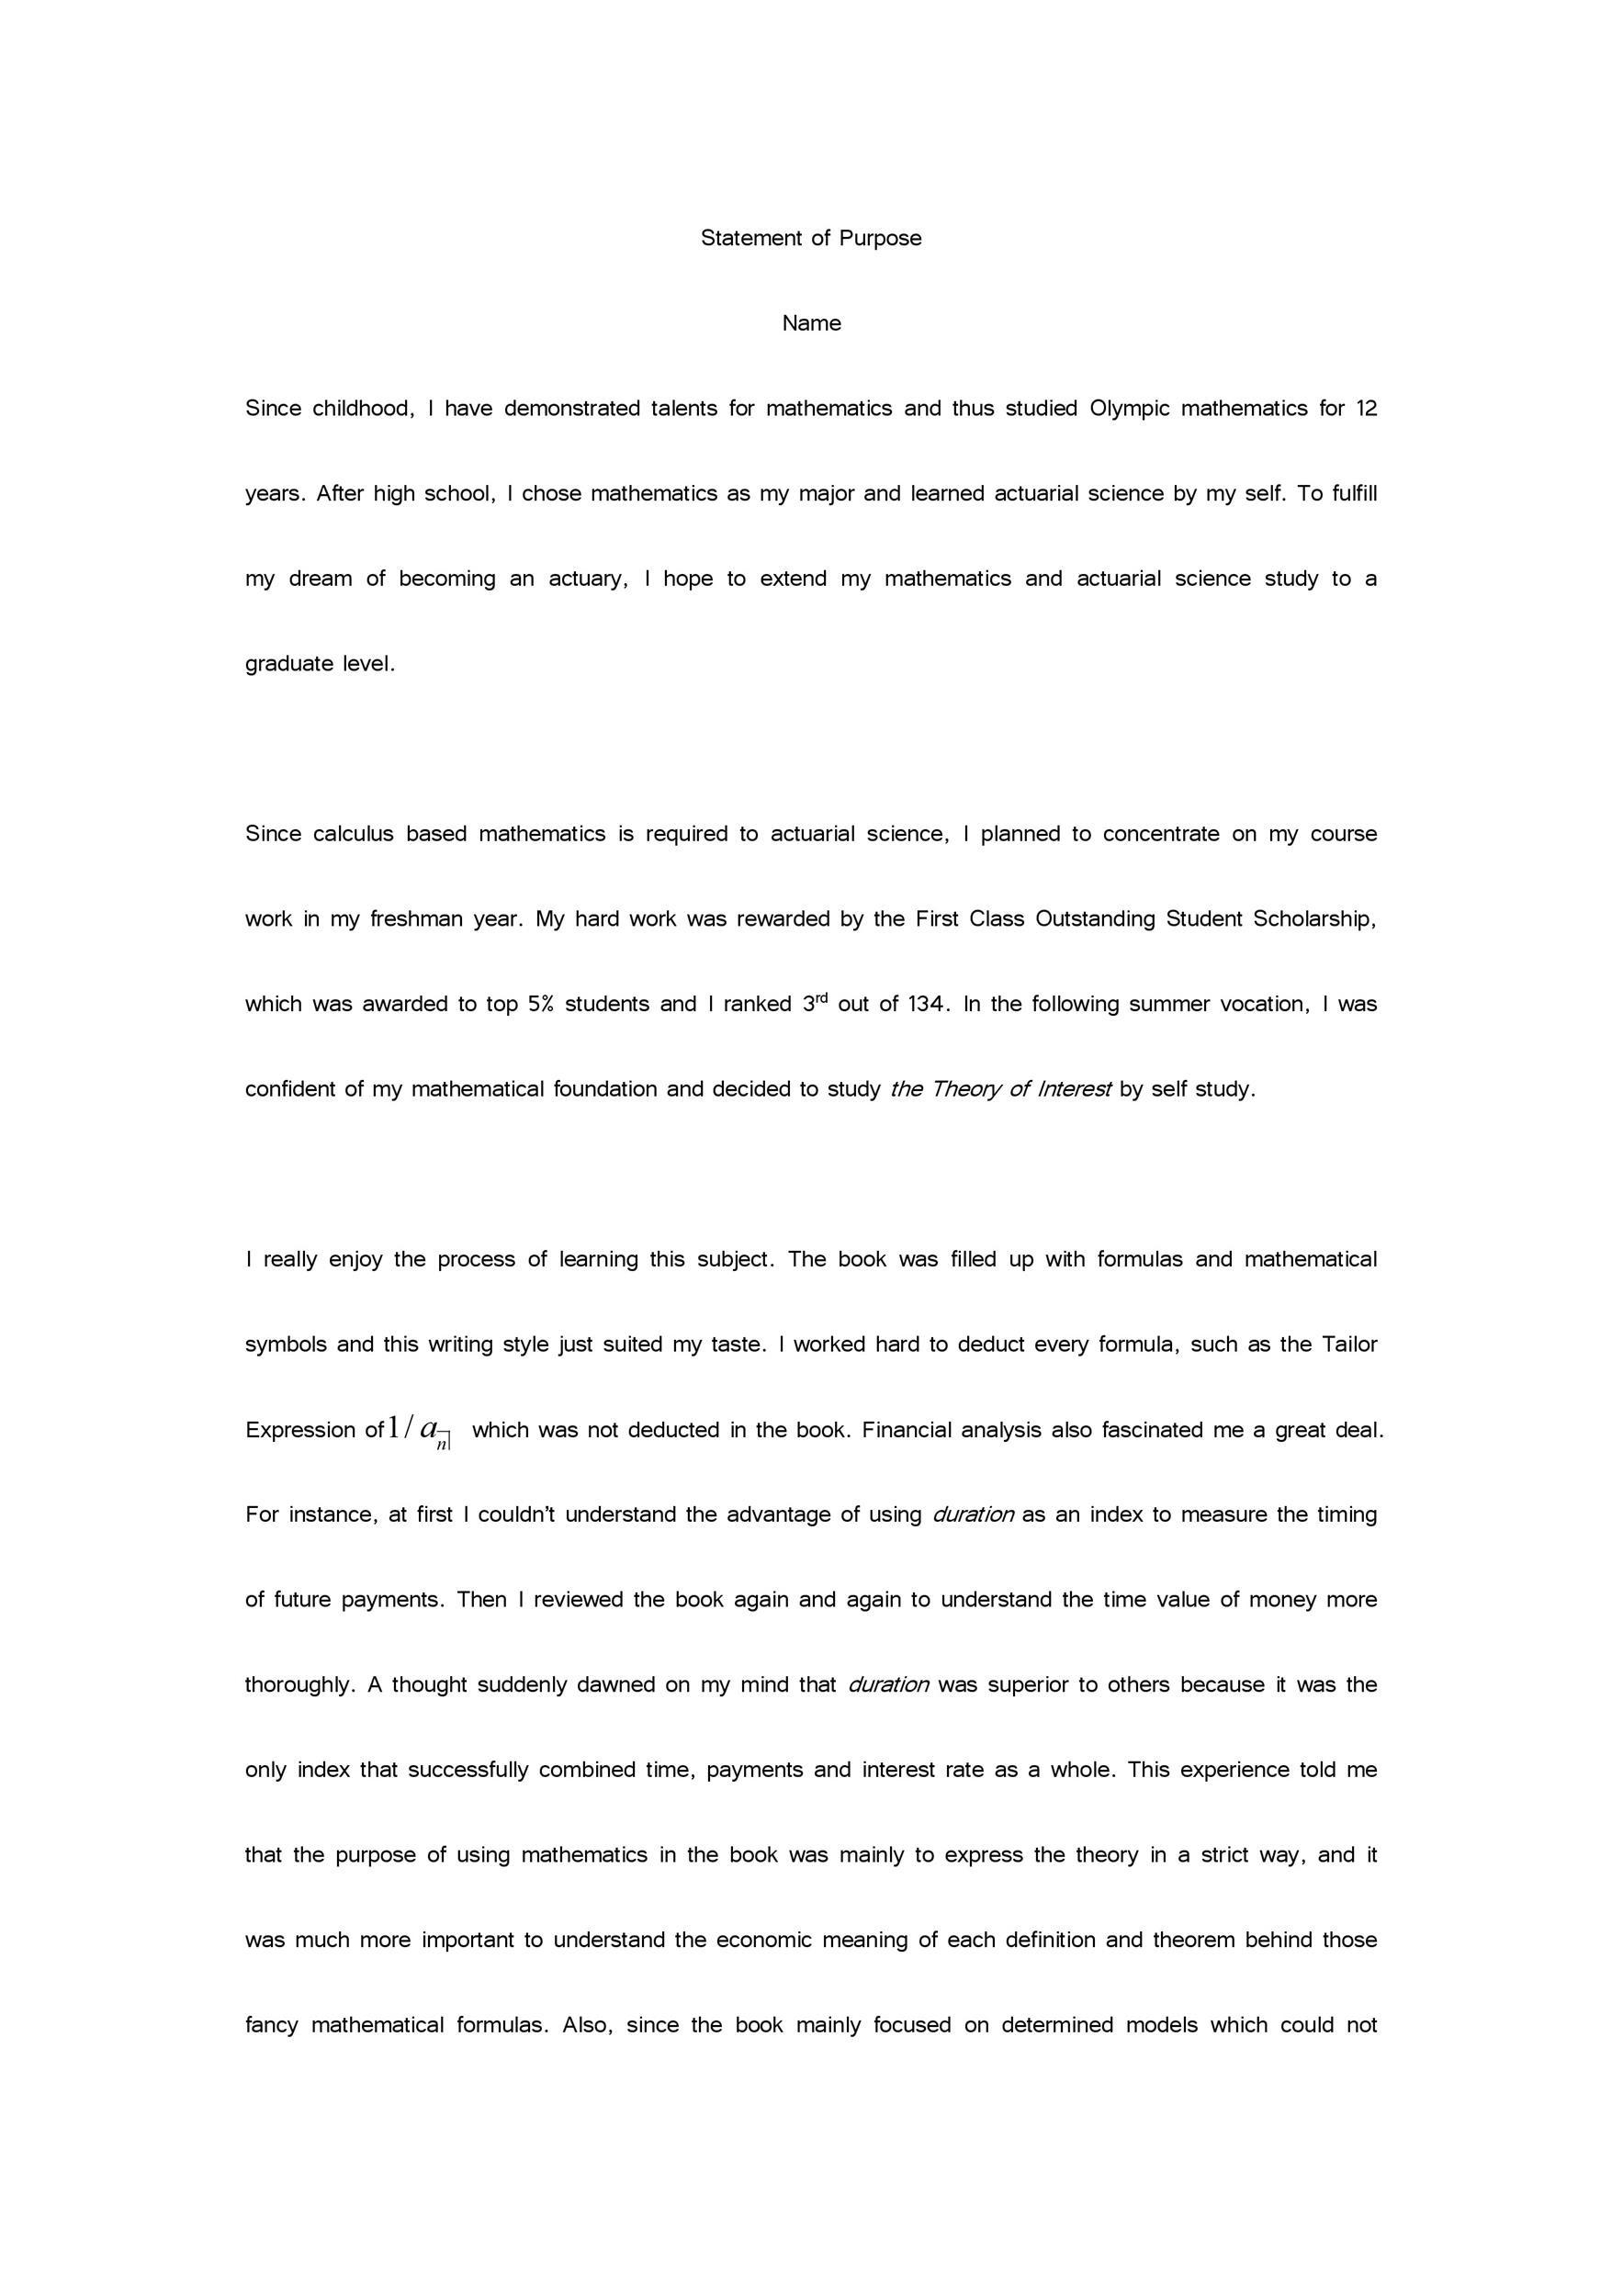 Free statement of purpose example 21